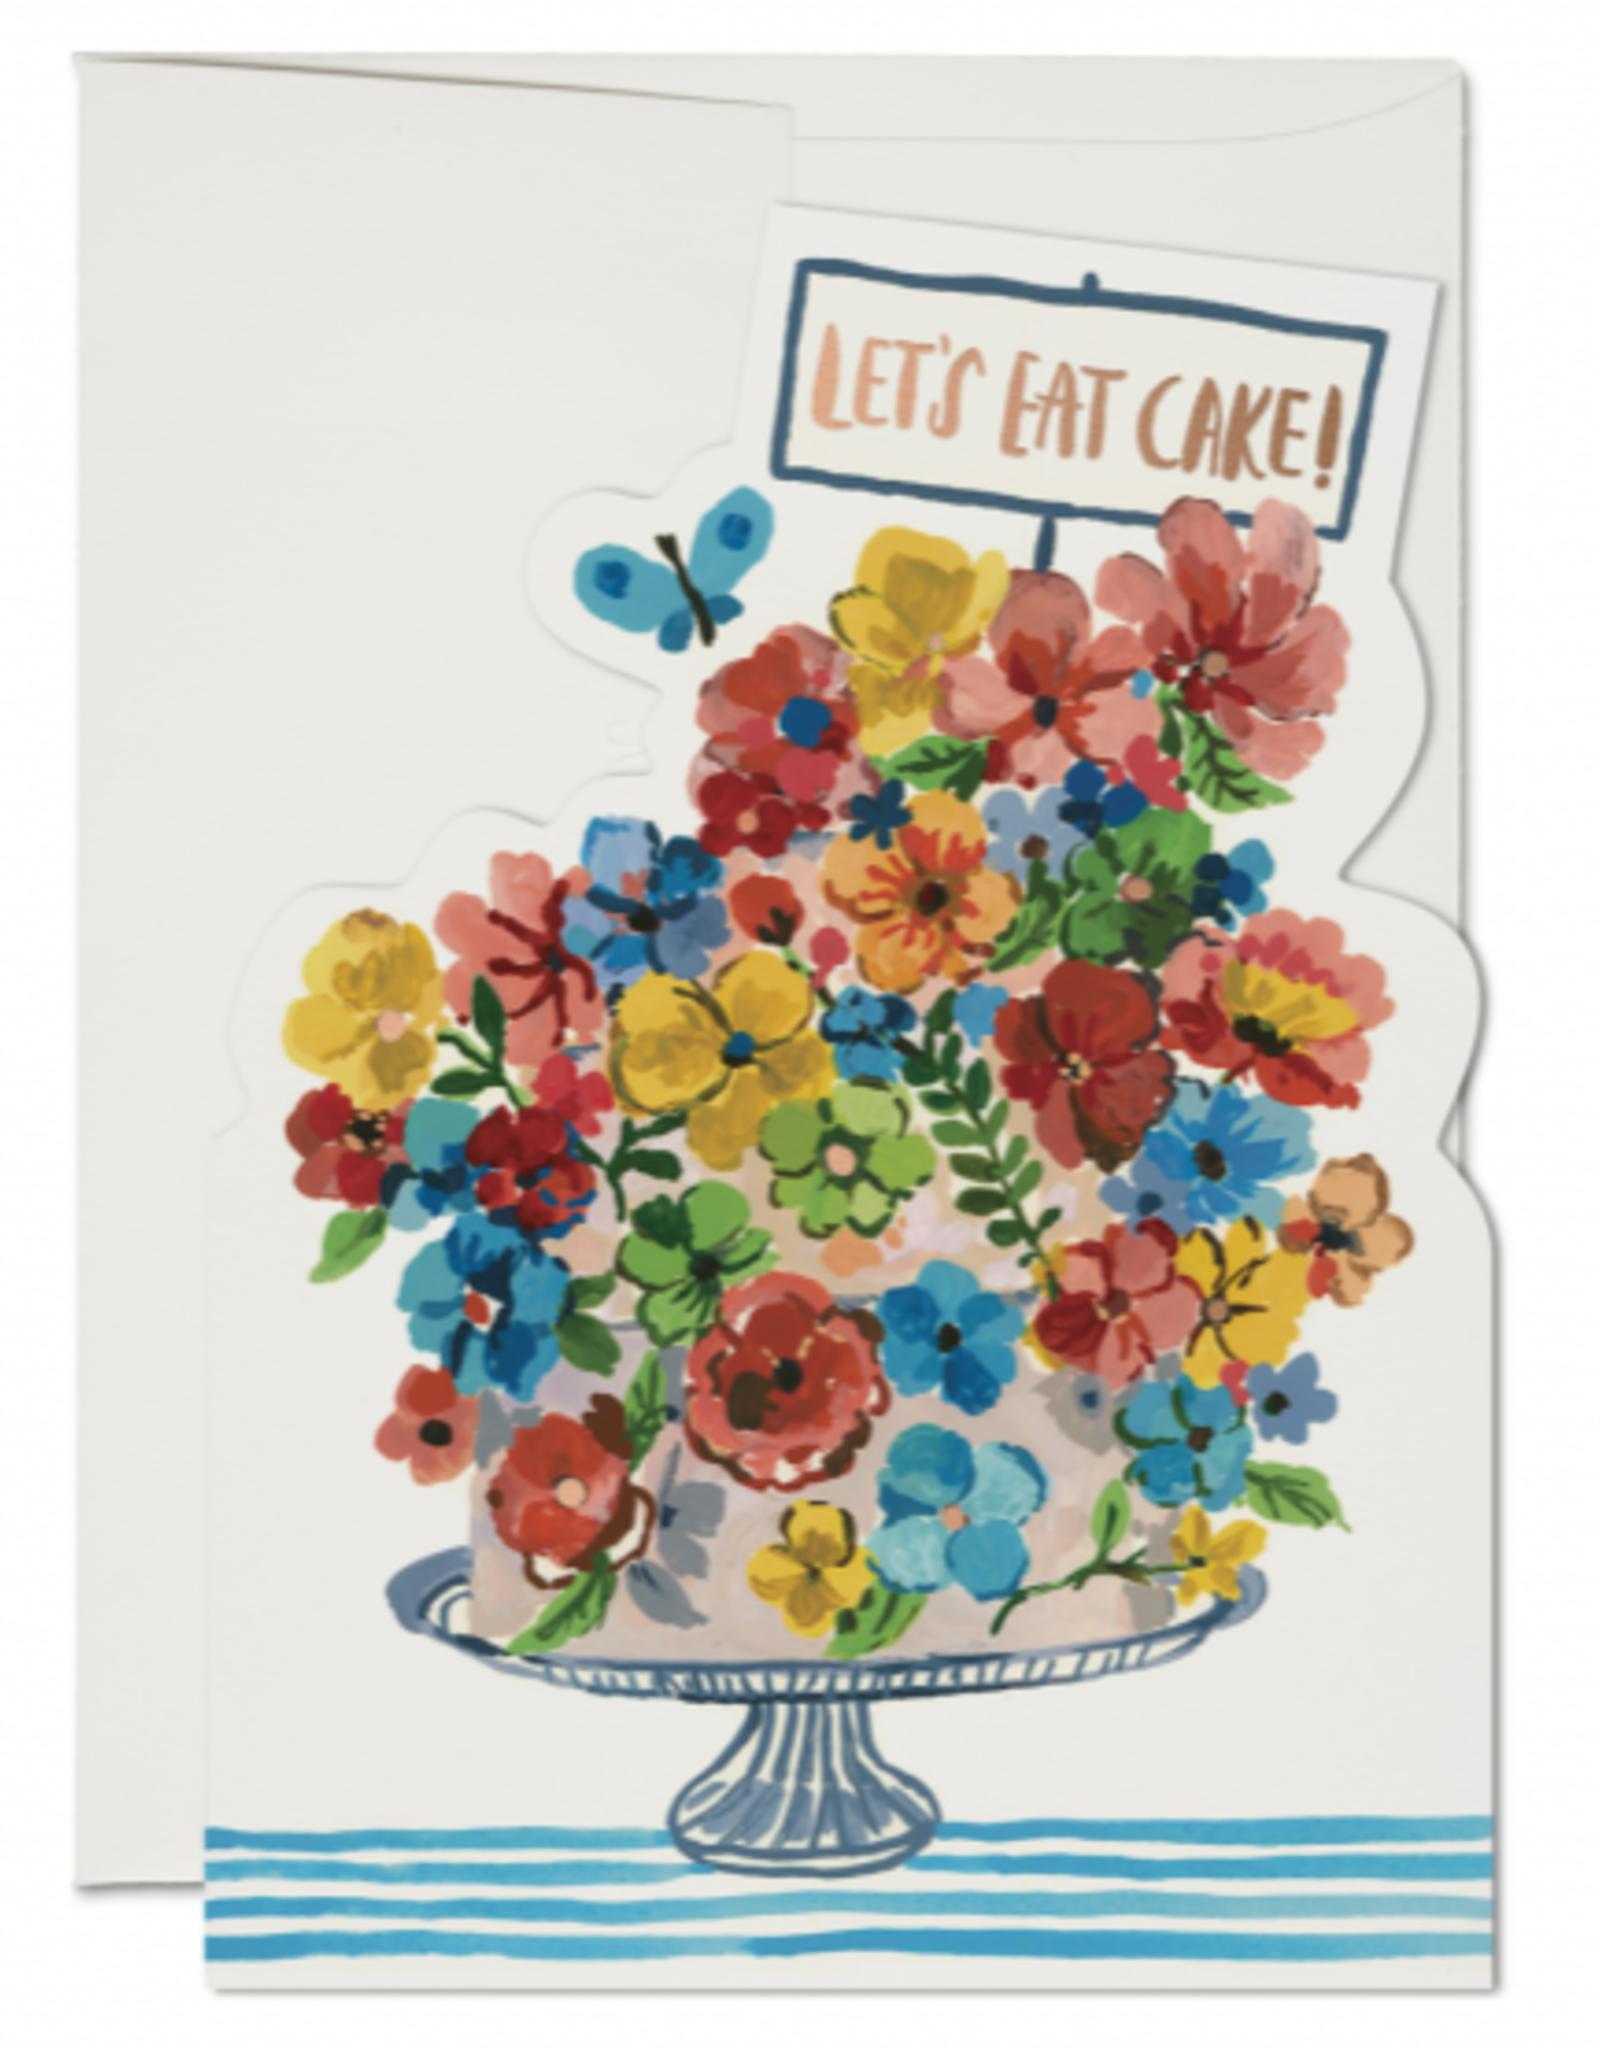 Let's Eat Cake Greeting Card